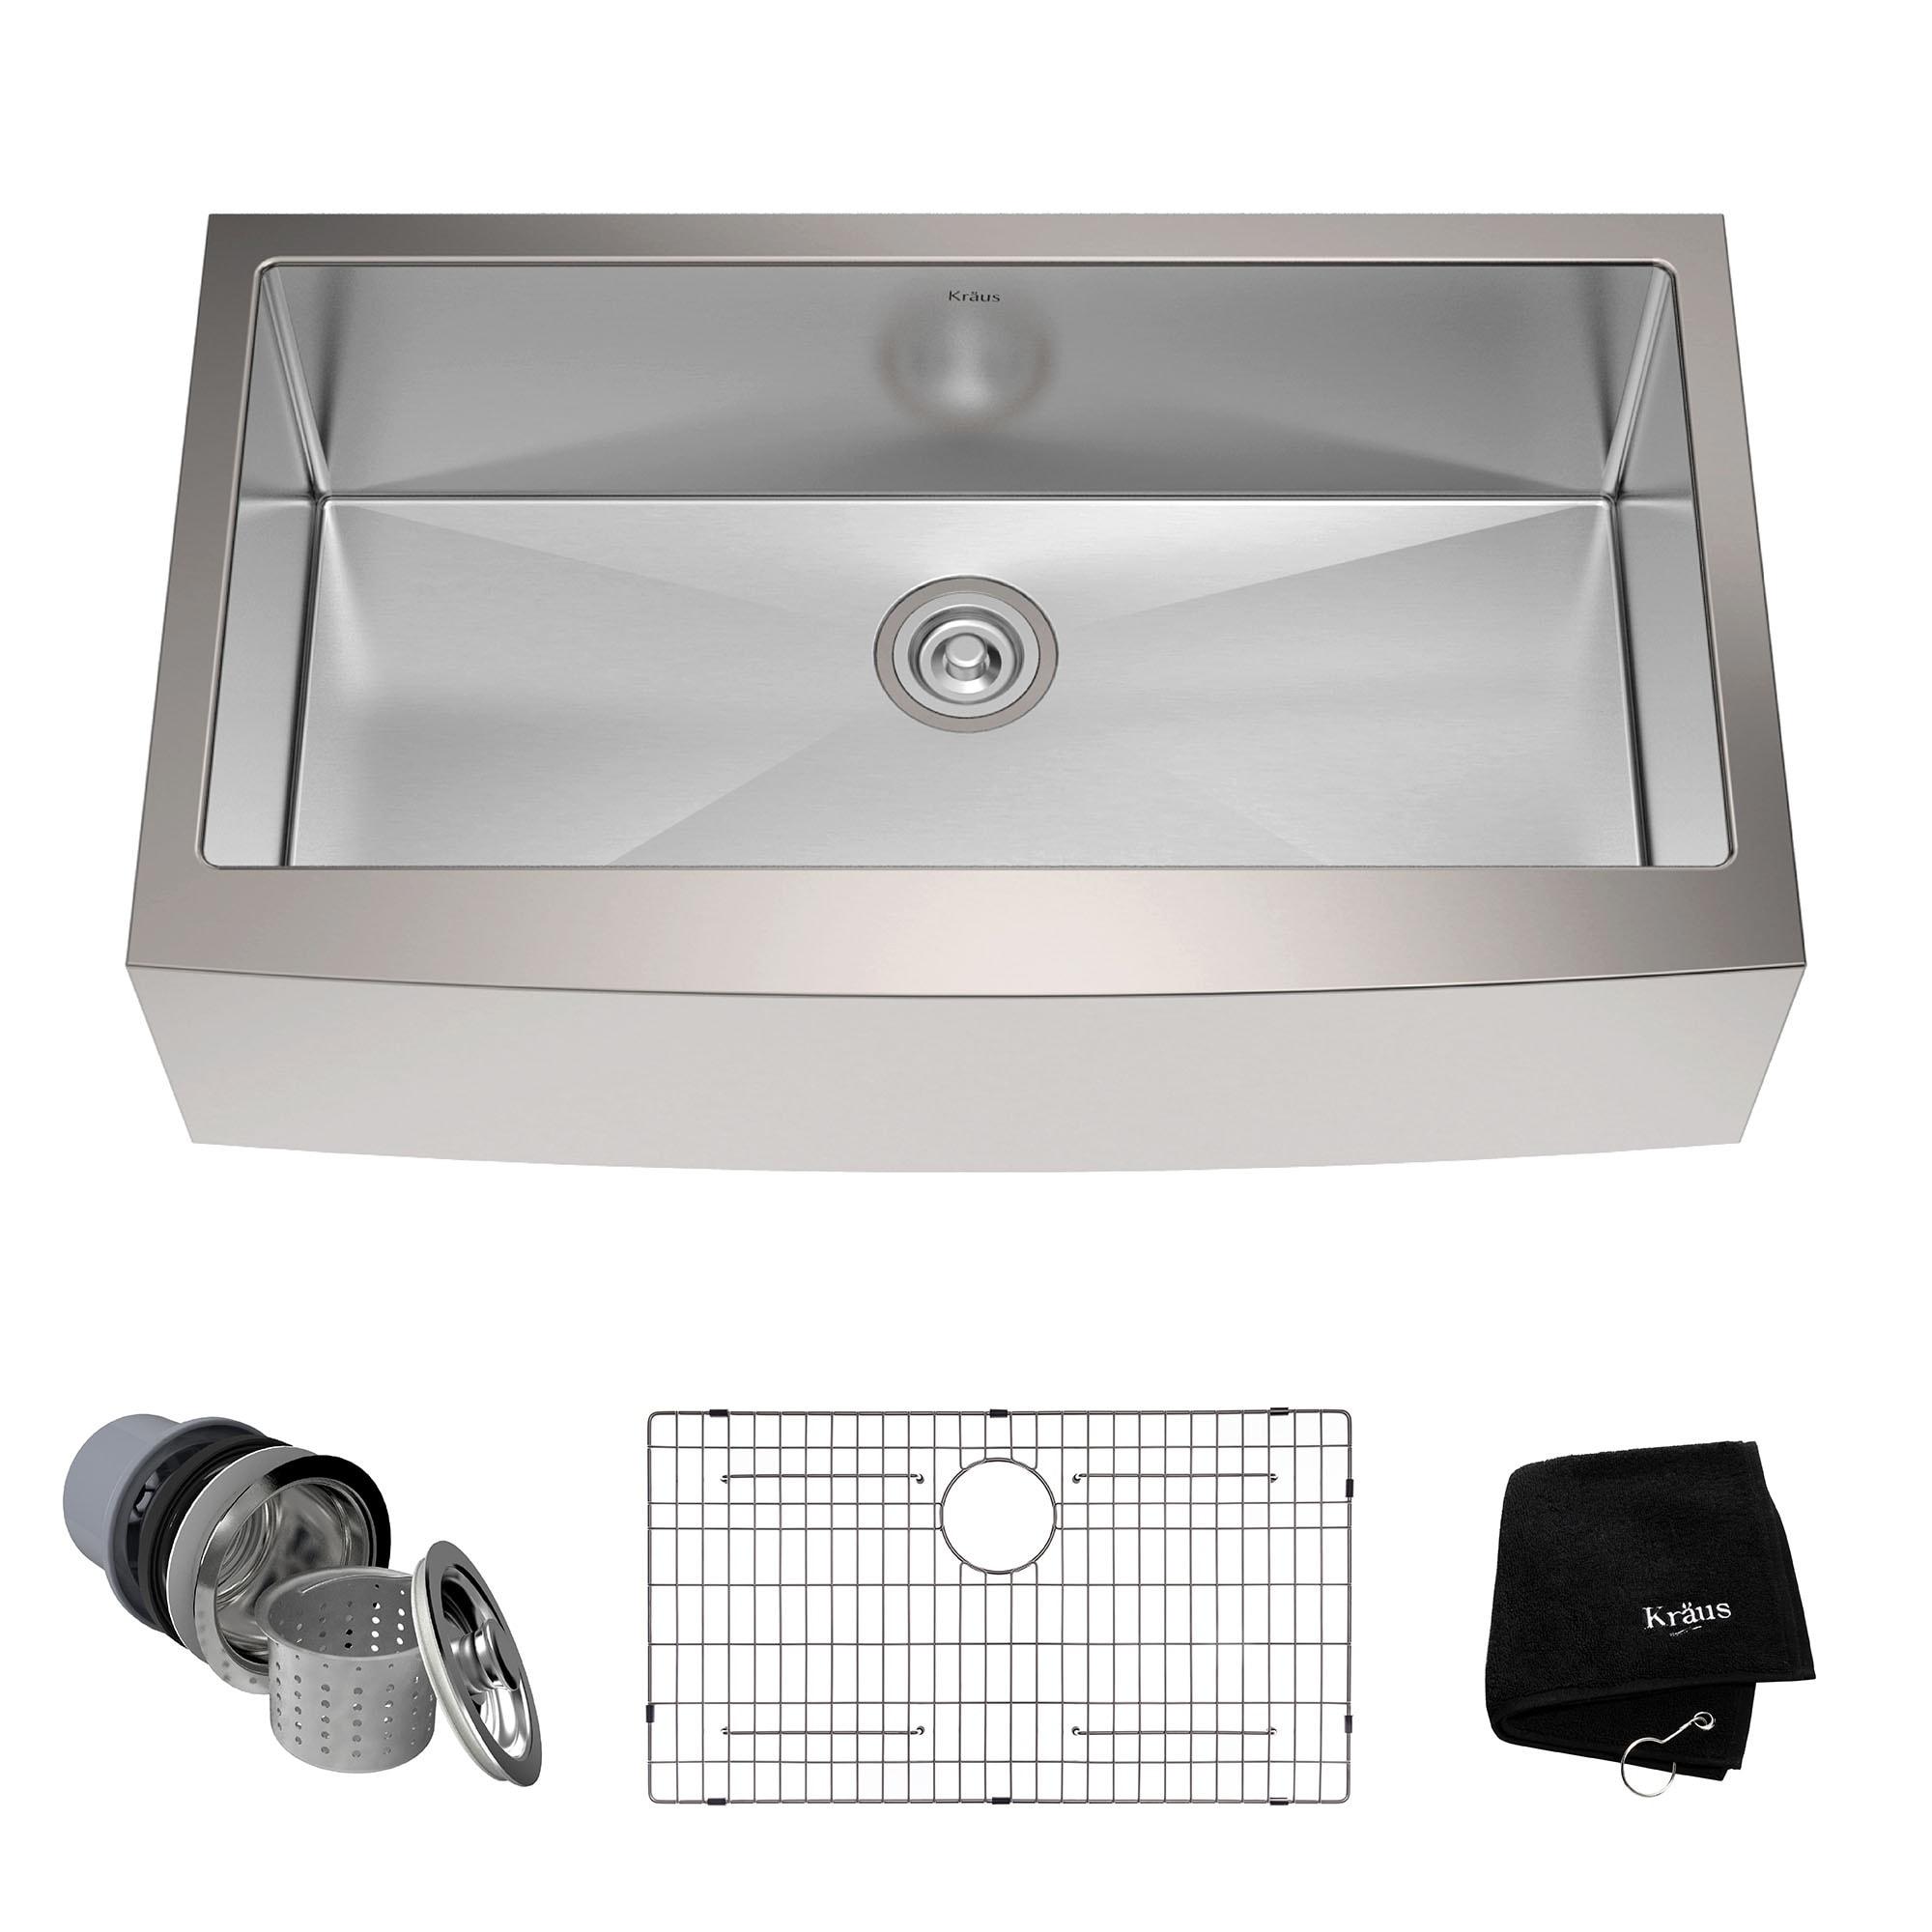 KRAUS 36 Inch Farmhouse Single Bowl Stainless Steel Kitchen Sink ...